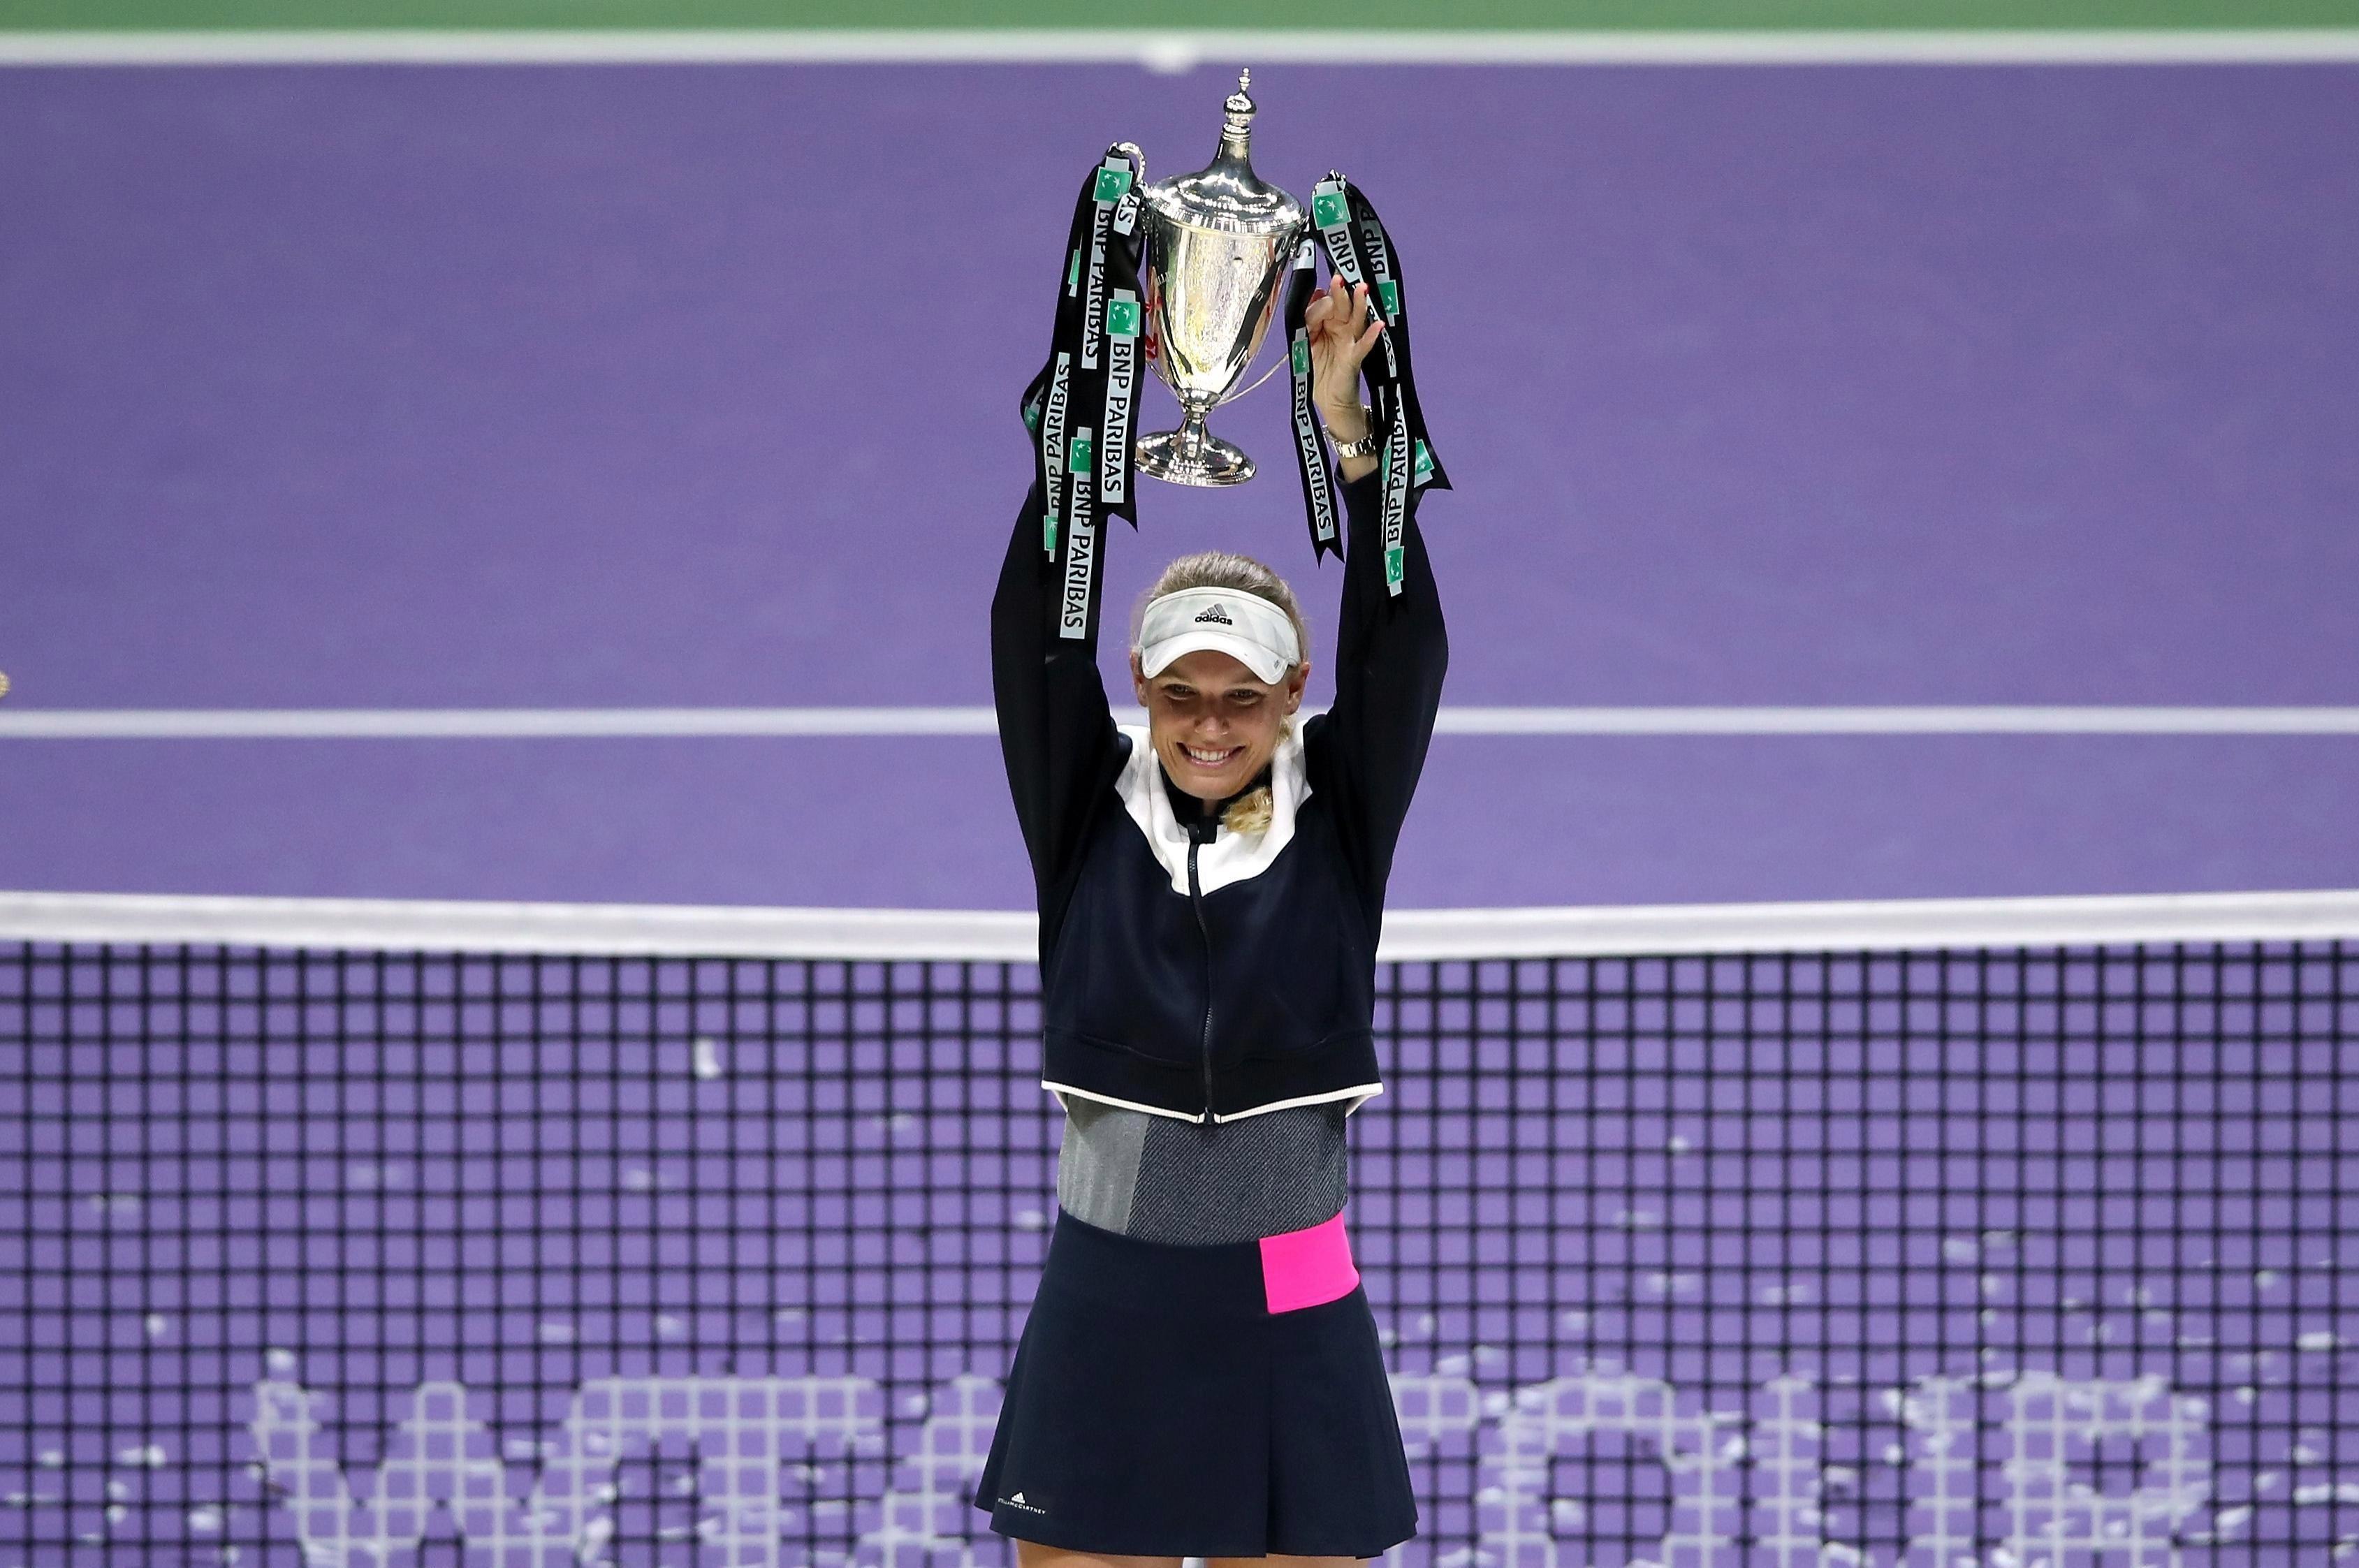 Caroline Wozniacki won the Billie Jean King Trophy in 2017, after beating Venus Williams